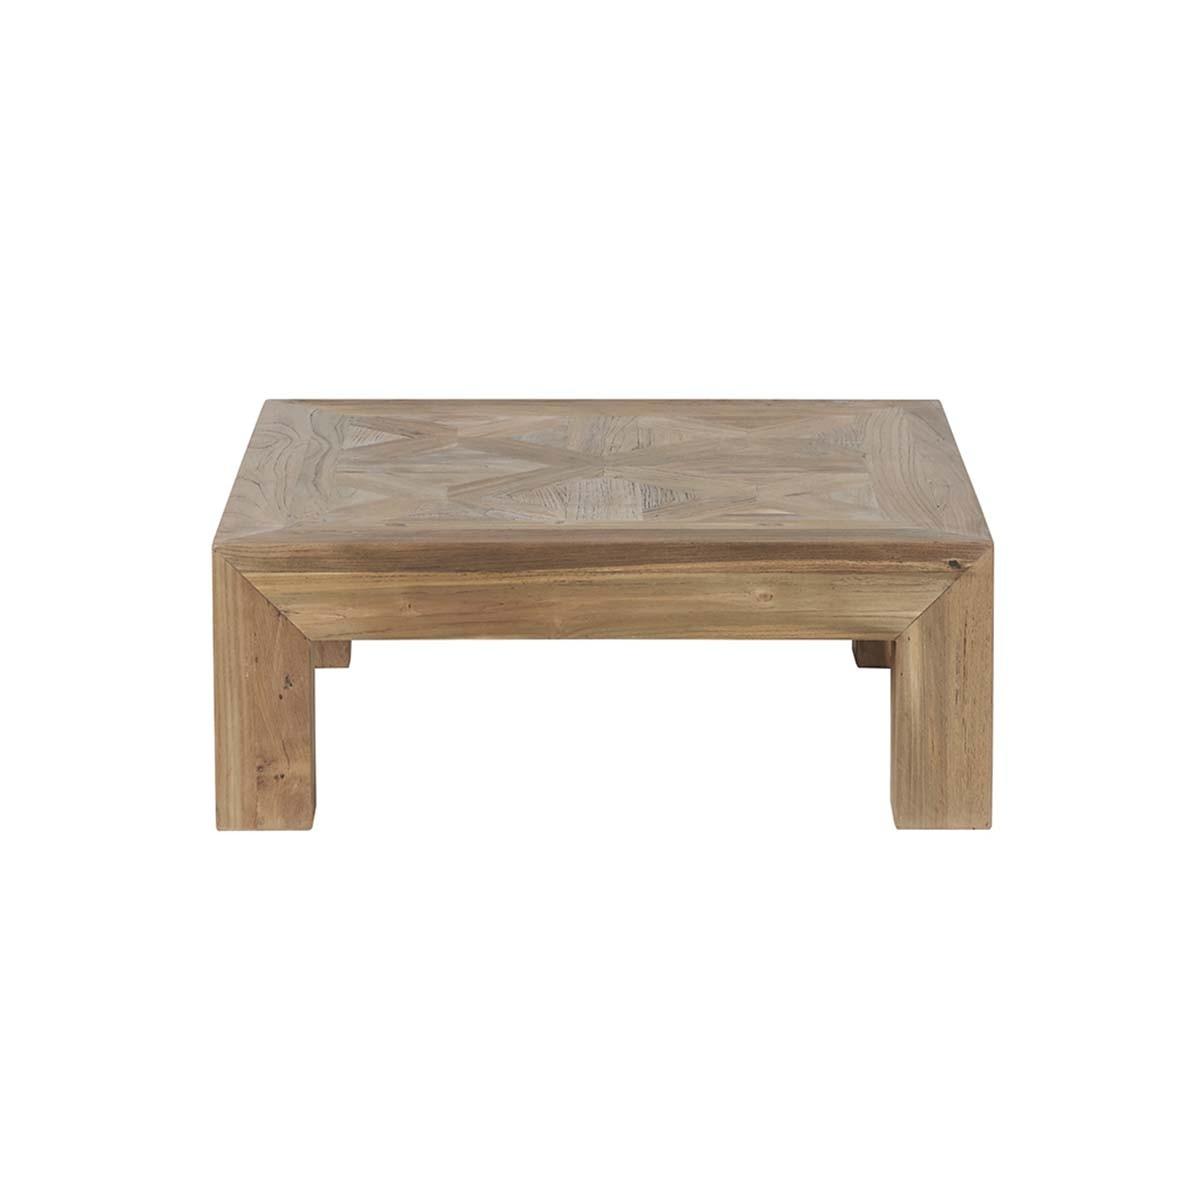 Table basse en teck recyclé